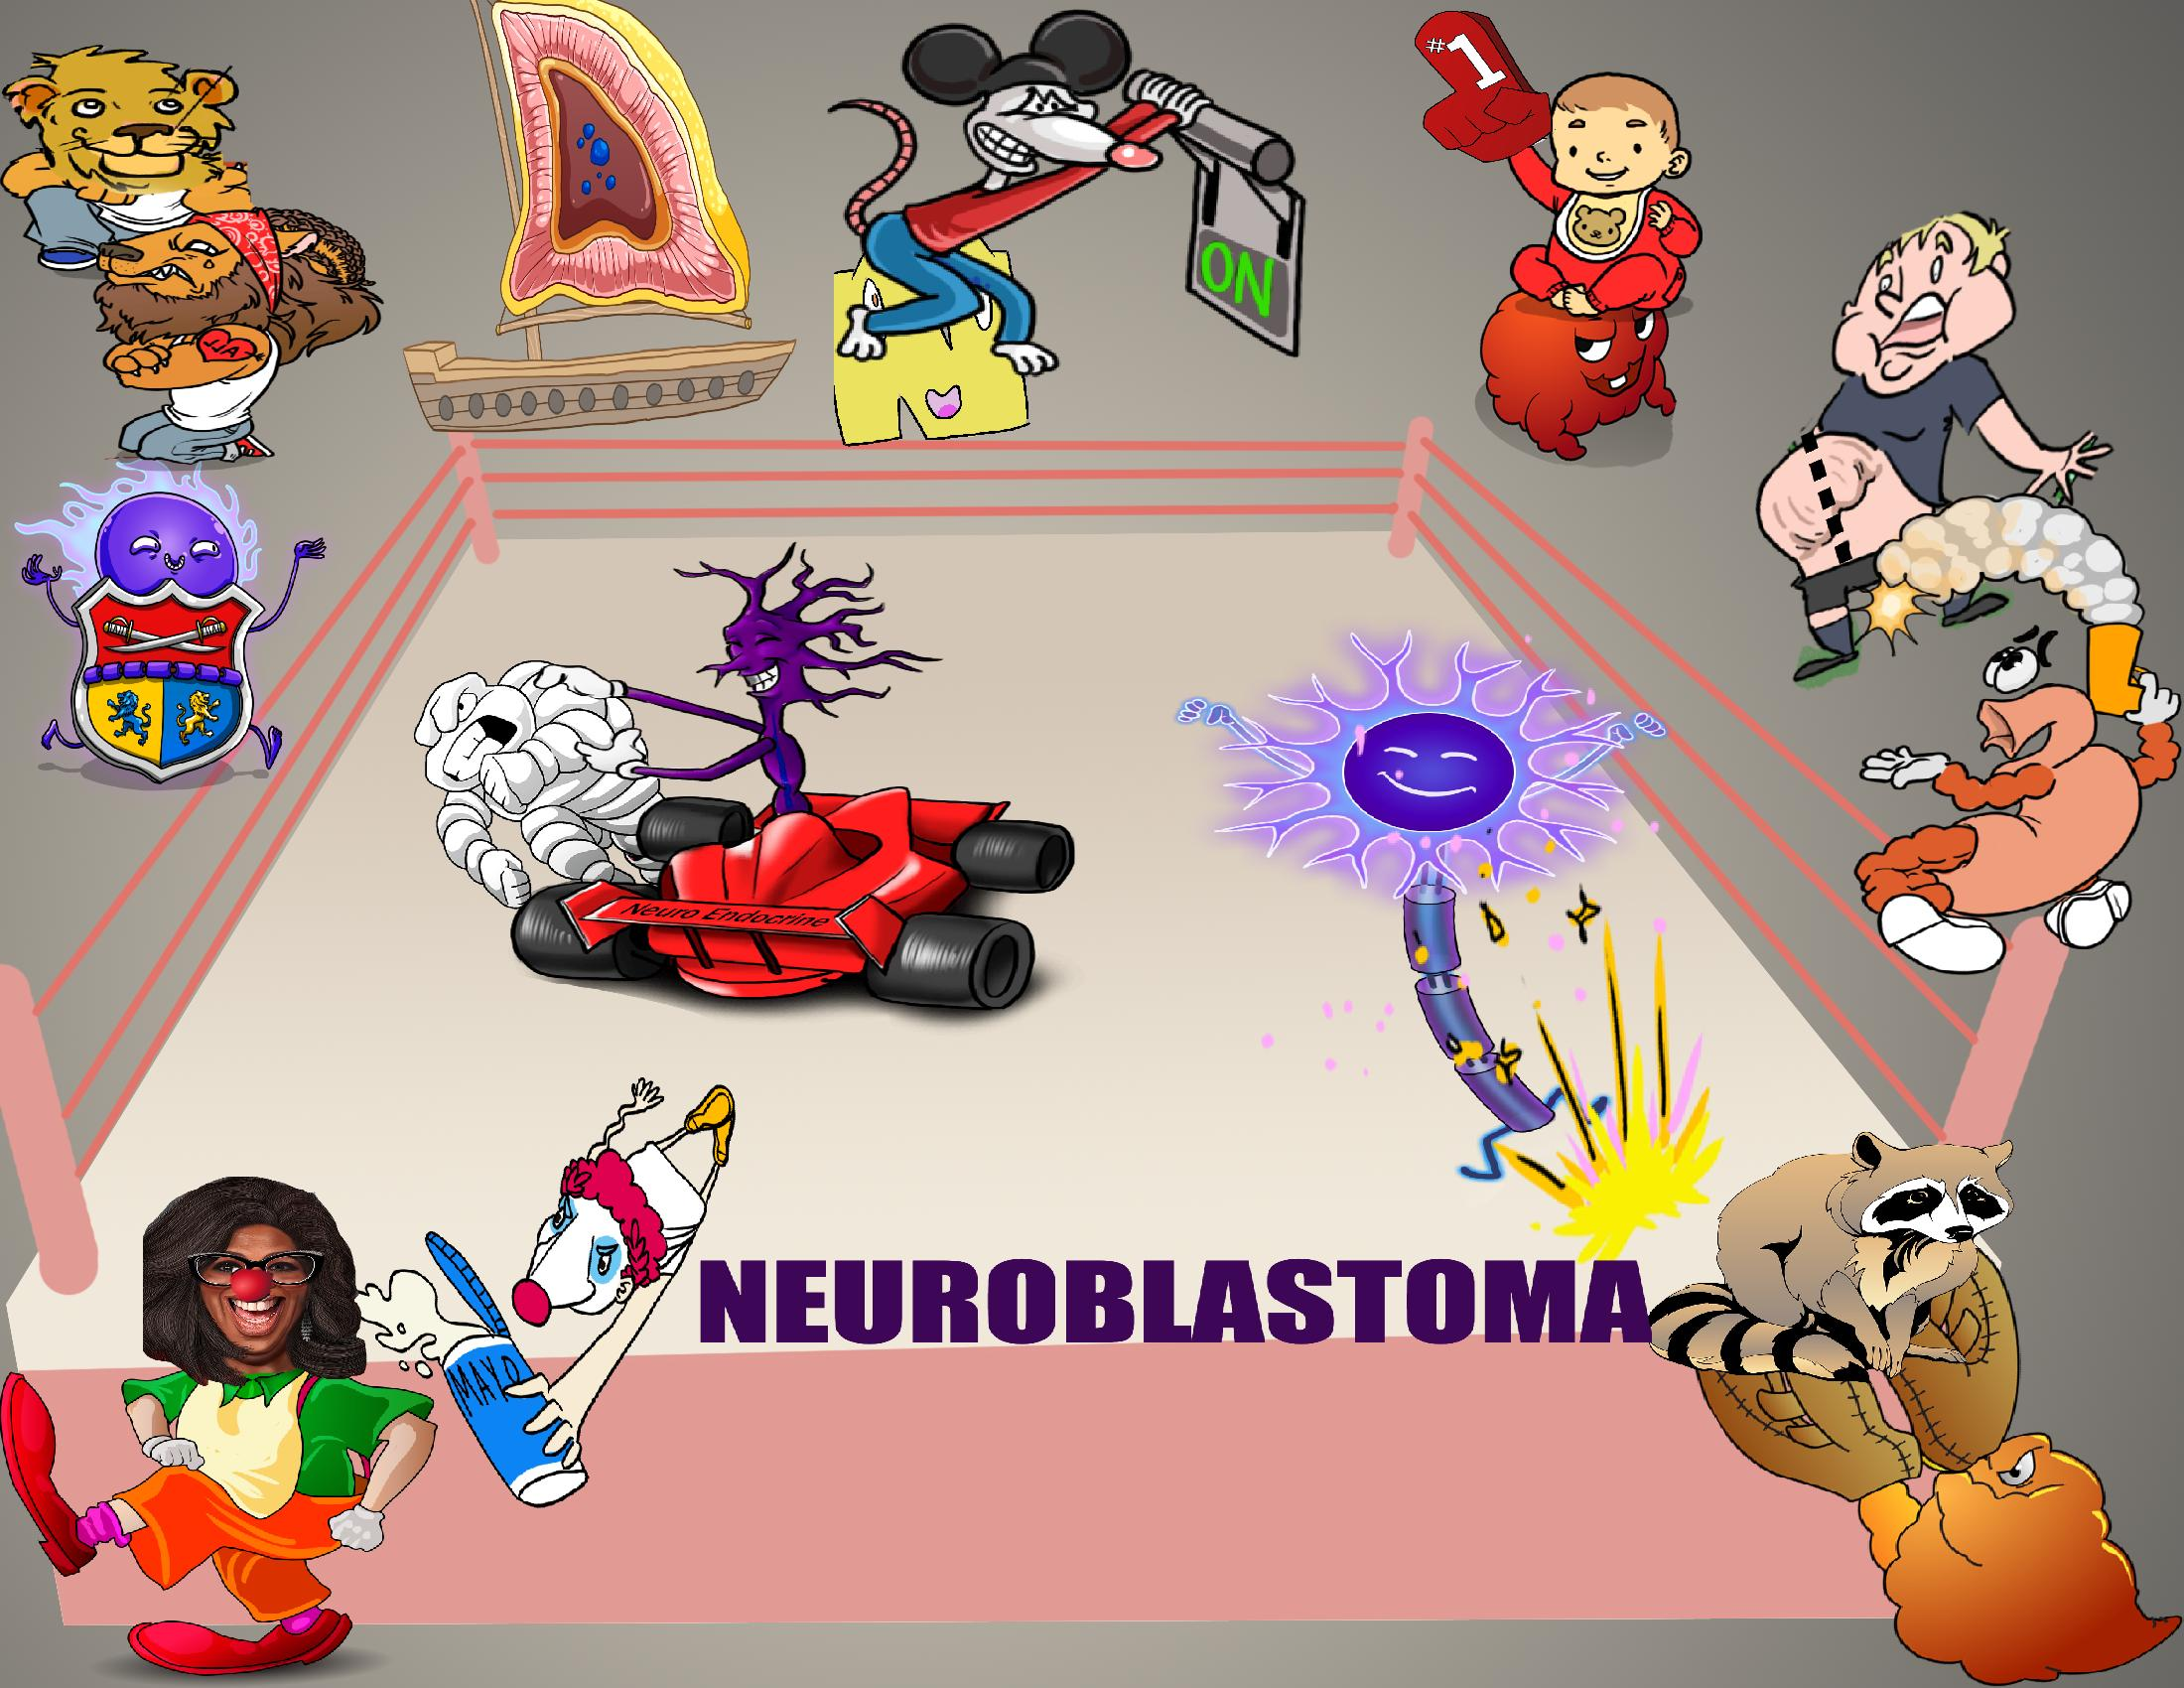 Neuroblastoma Characteristics and Presentation